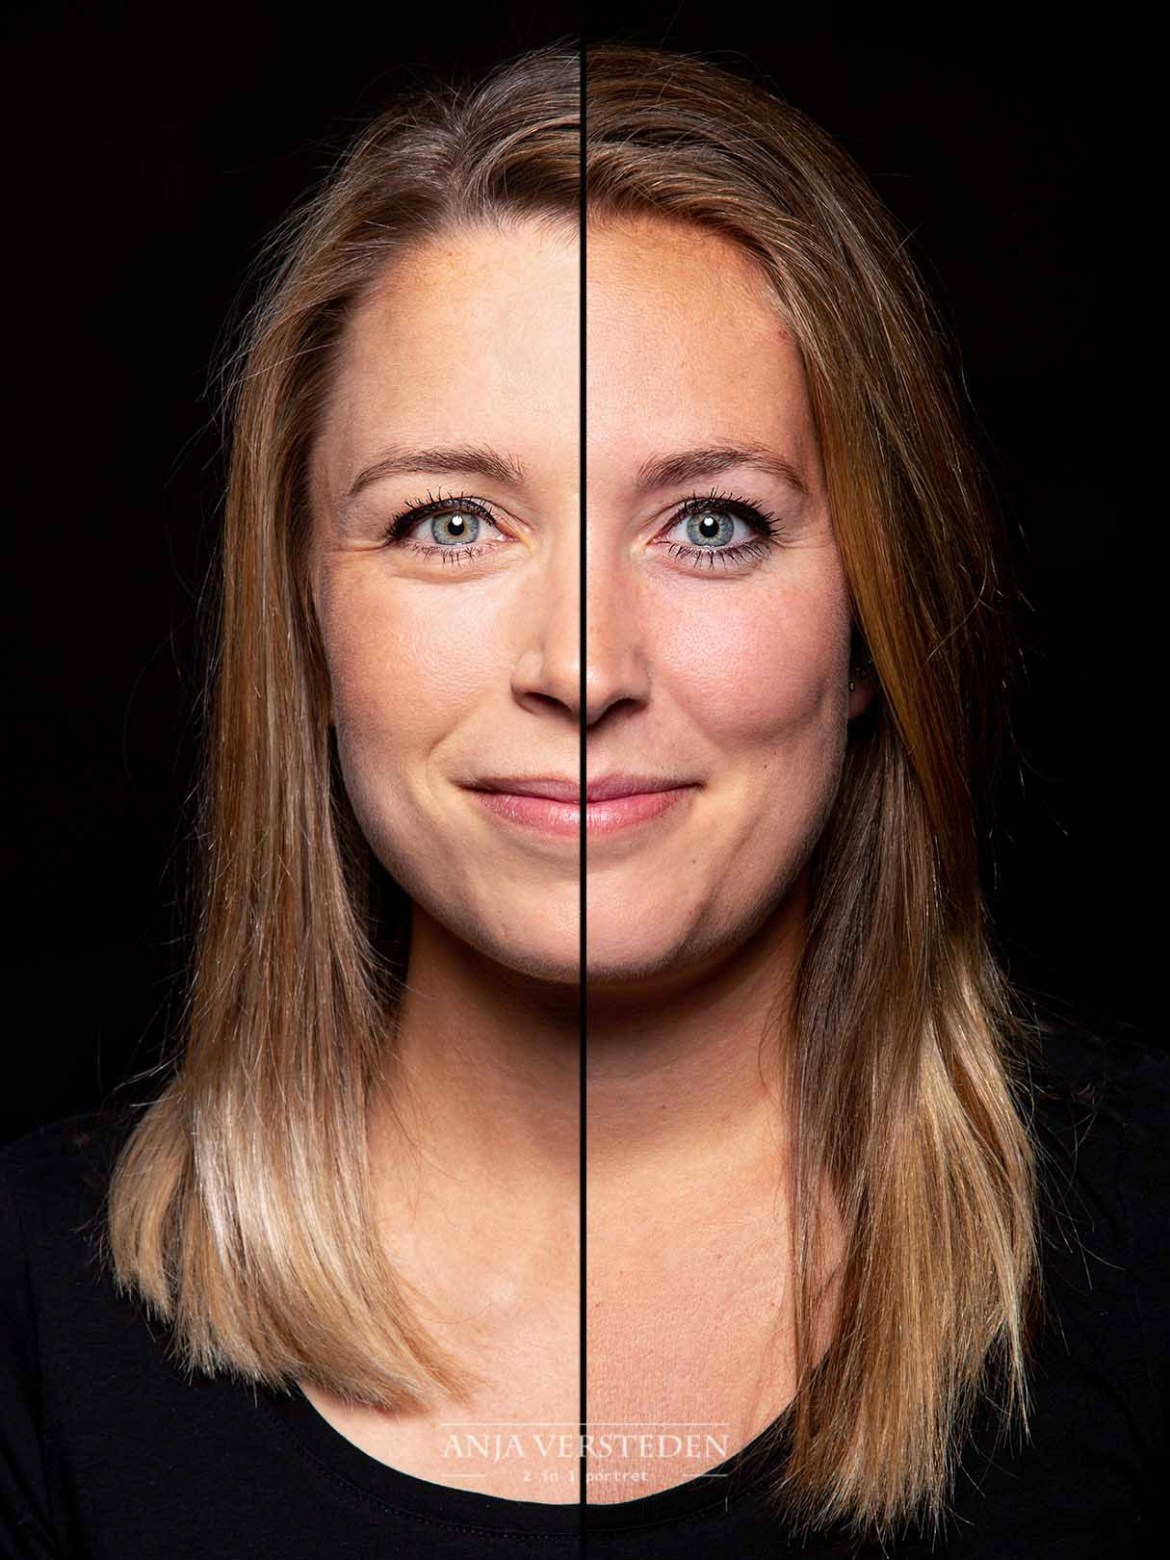 Splitfoto | Splitface zusjes fotografie